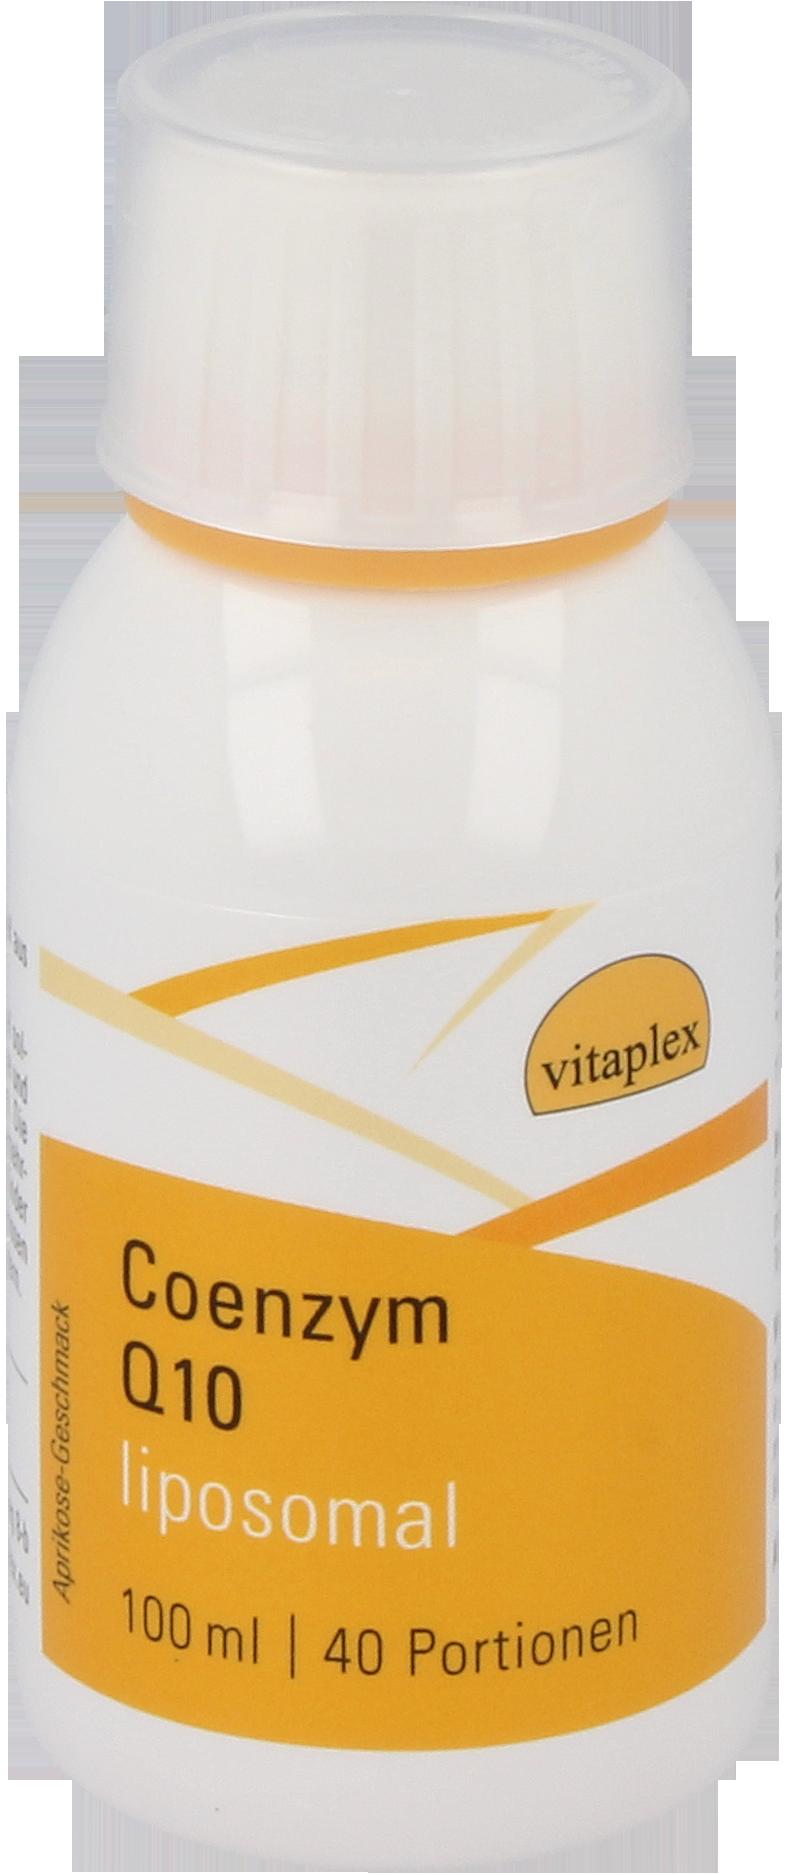 Image of Coenzym Q10 liposomiale (100 ml) - Vitaplex 8719322084156